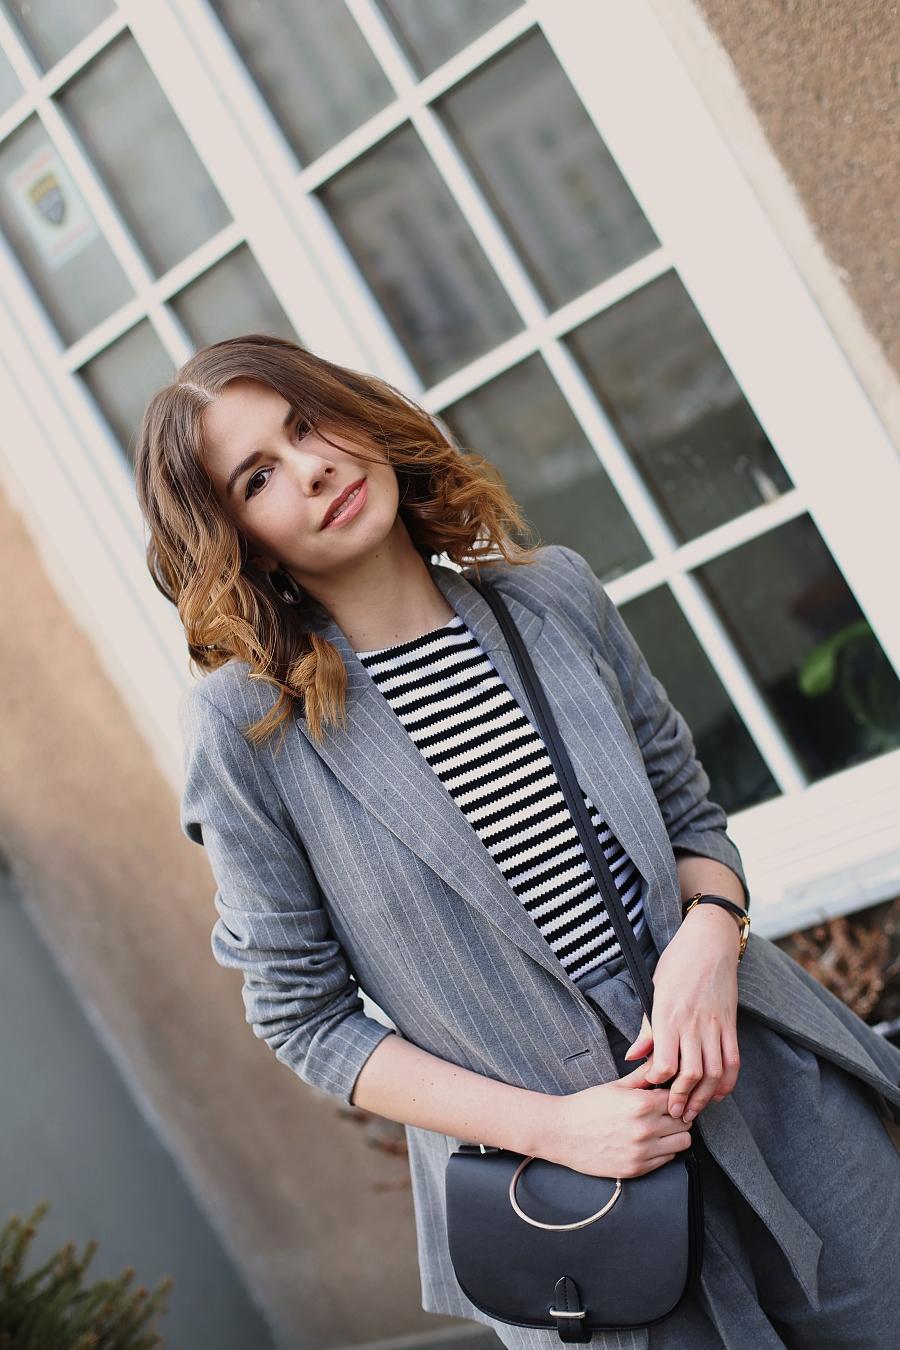 damski garnitur: pasiasta marynarka i szerokie spodnie H&M